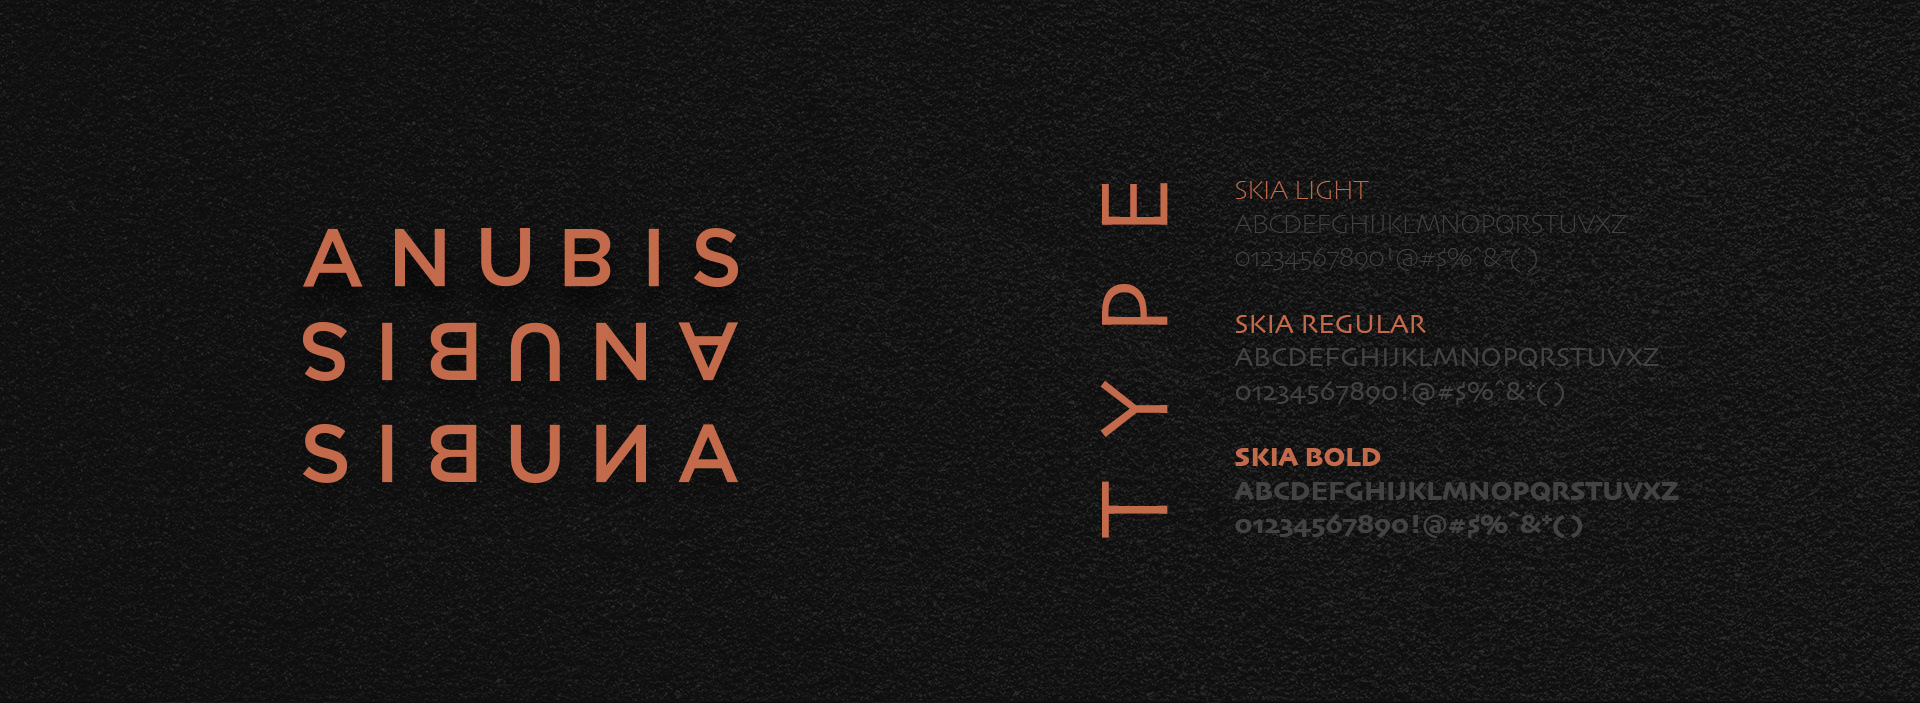 Luiz Arthuso Design Studio - Sibuna - Winery5.jpg